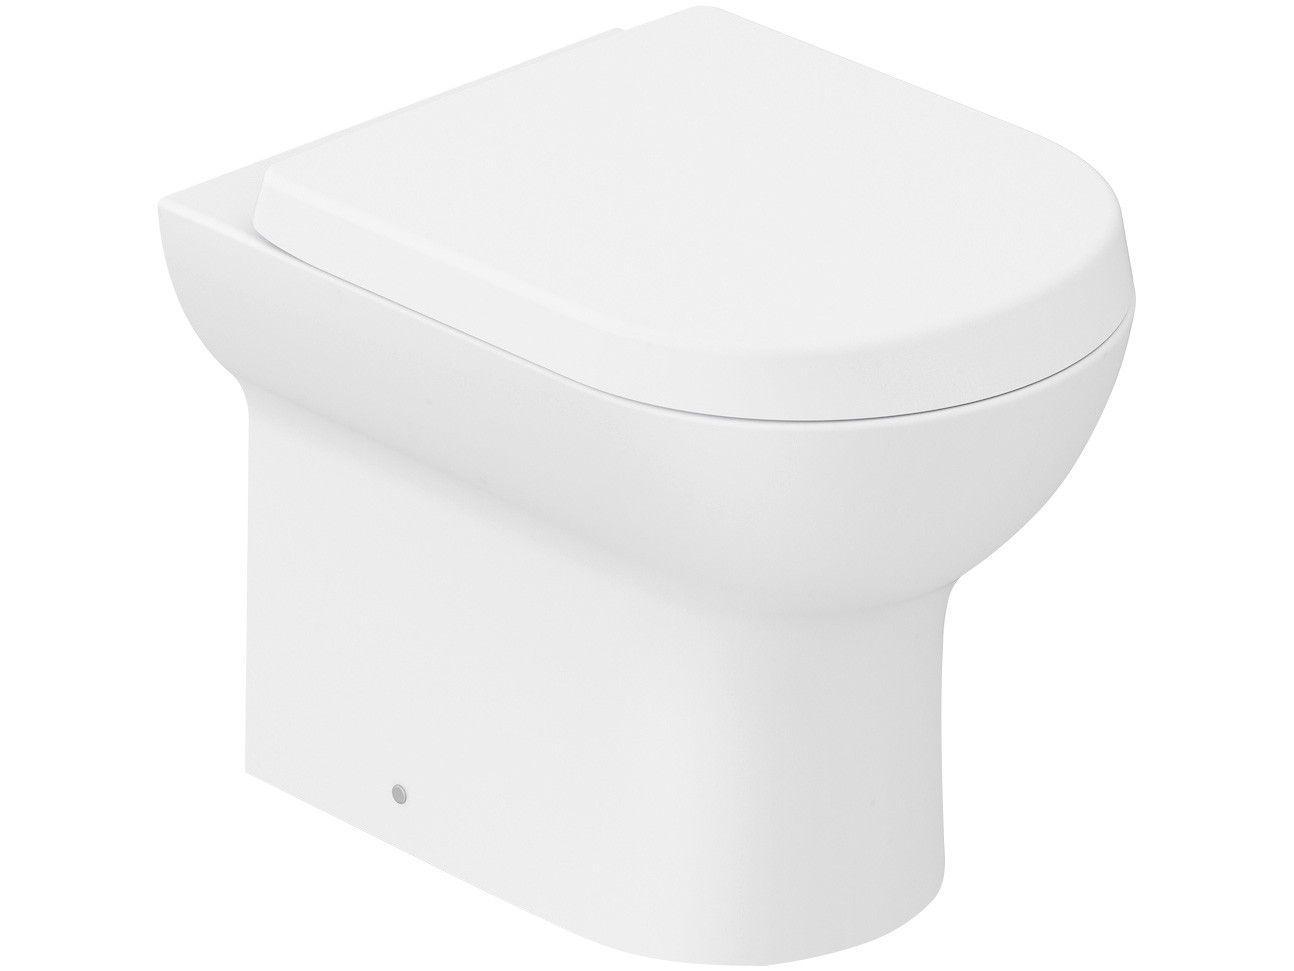 Vaso Sanitário Convencional Oval Branco Matte Roca - Nexo